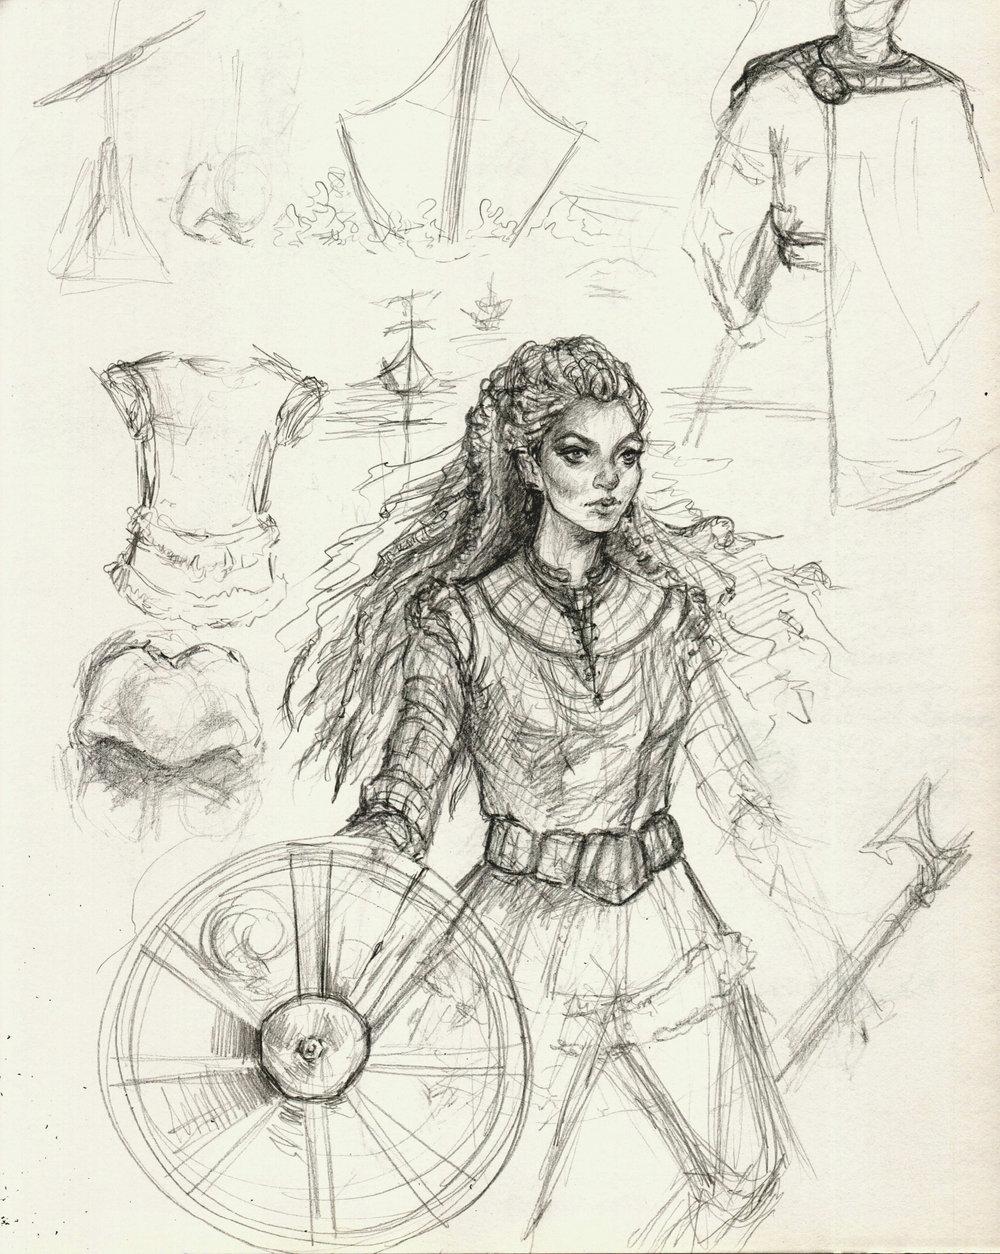 VikingsSketch03.jpg